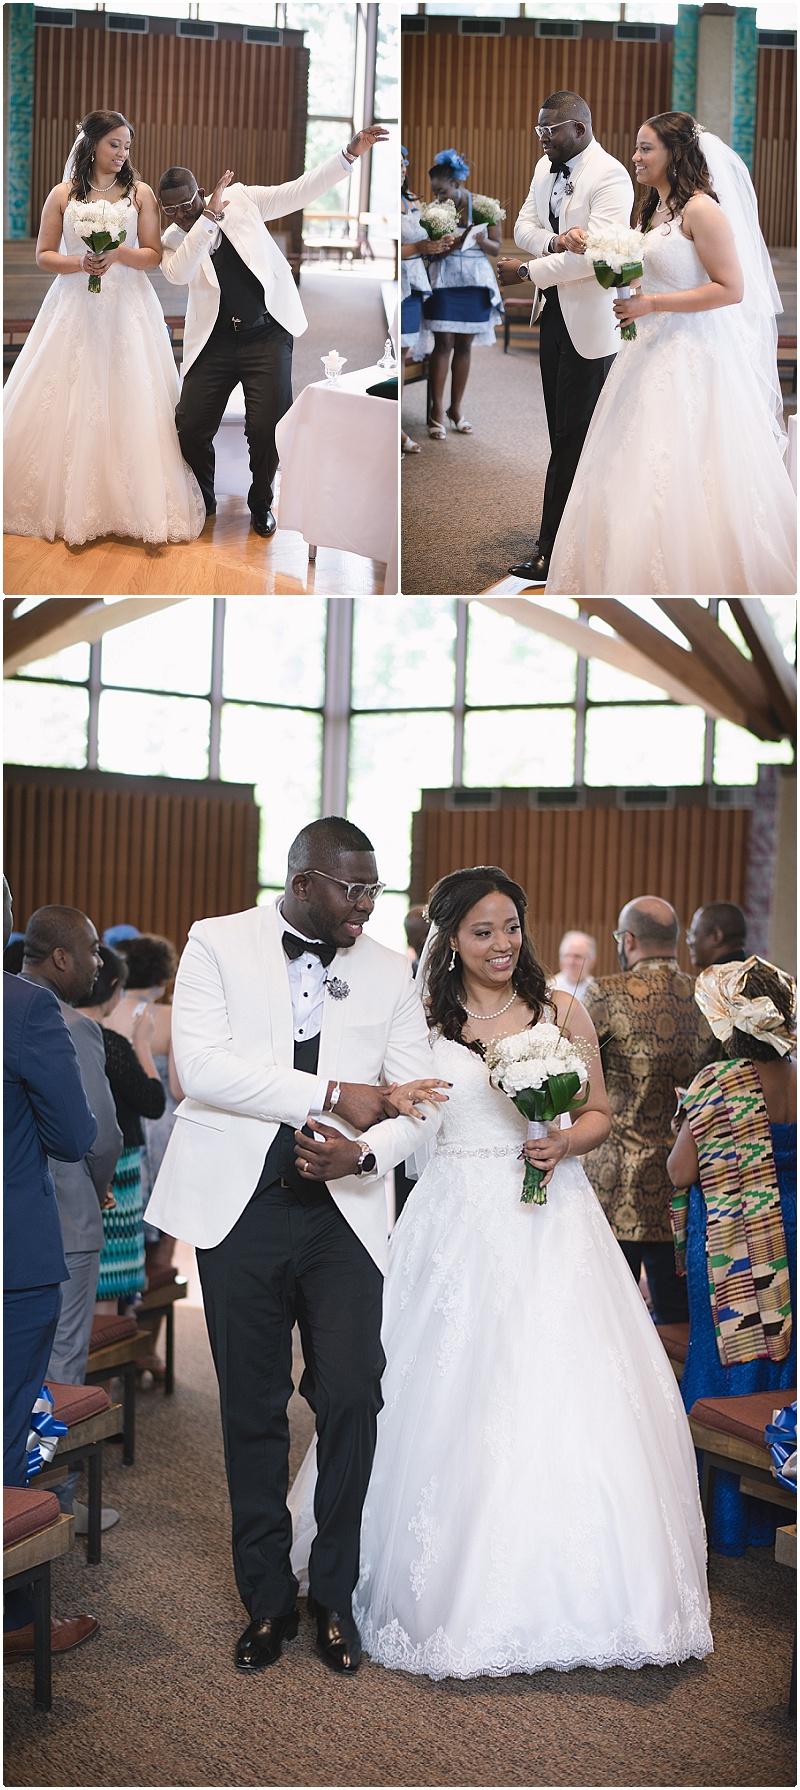 Gianna's Photography Macalester Wedding St. Paul Minnesota (17).jpg